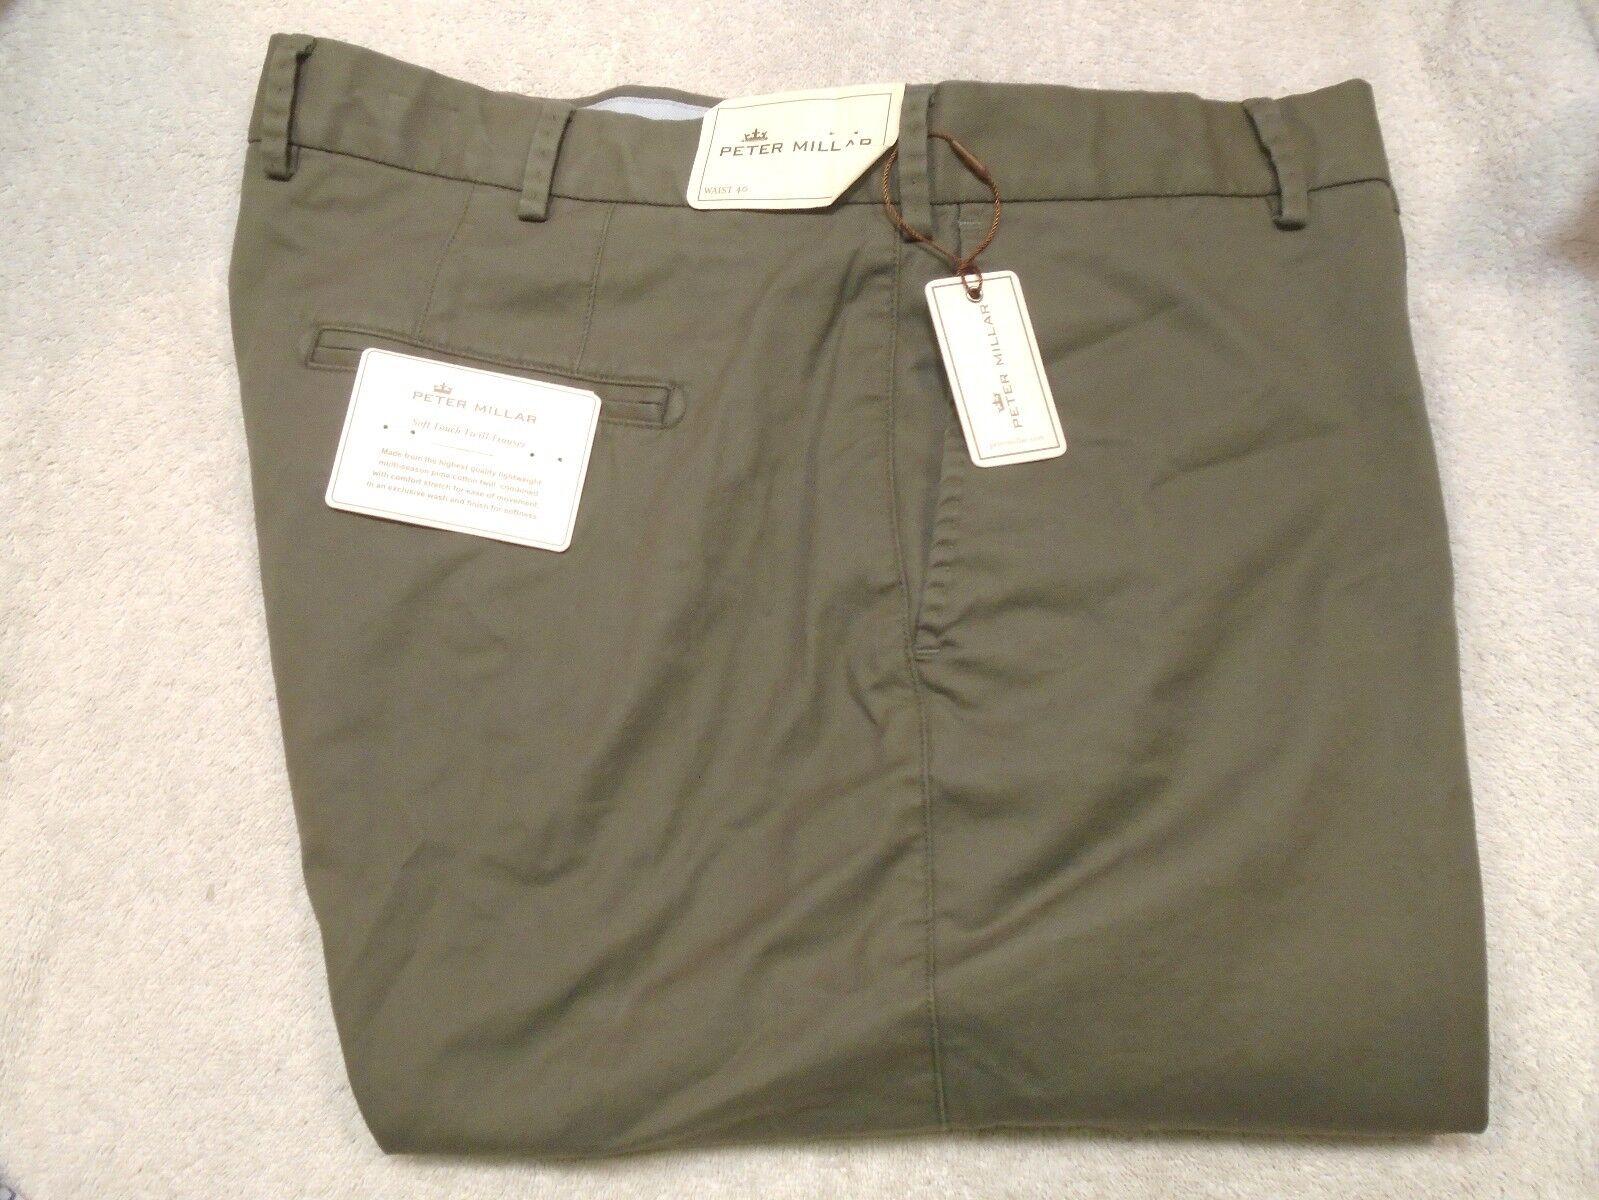 Peter Millar Soft Touch Twill Pima Cotton Khaki Pants NWT  40 x 36 Granite